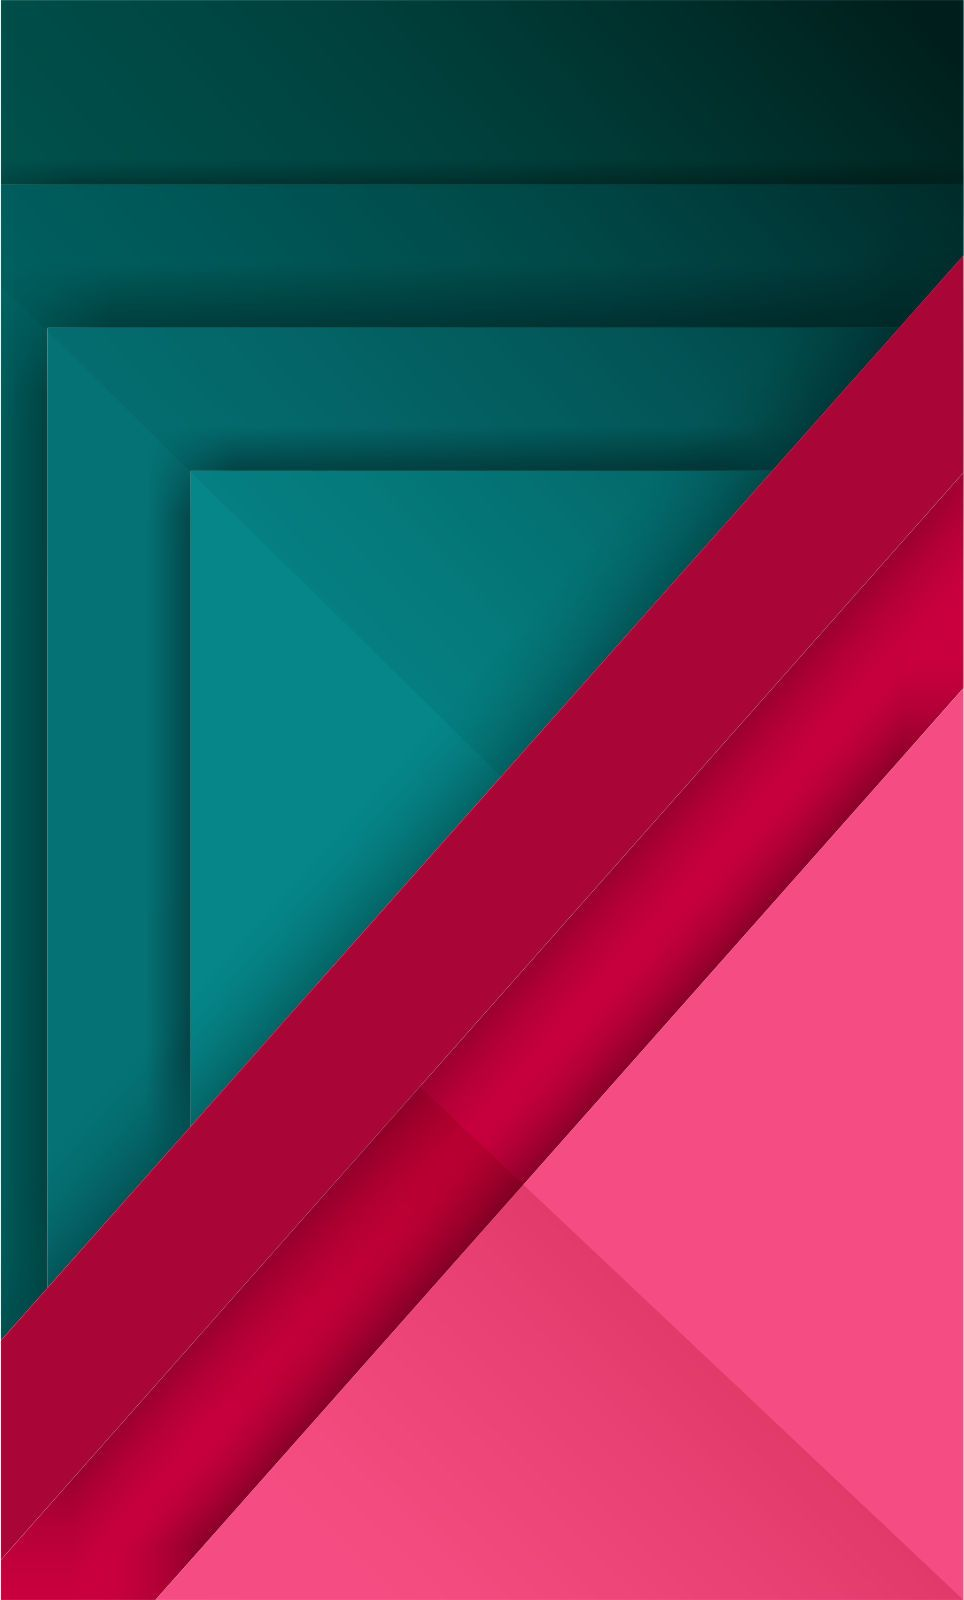 Stock Wallpaper Android M Desain Bahan2 Fondos De Pantalla